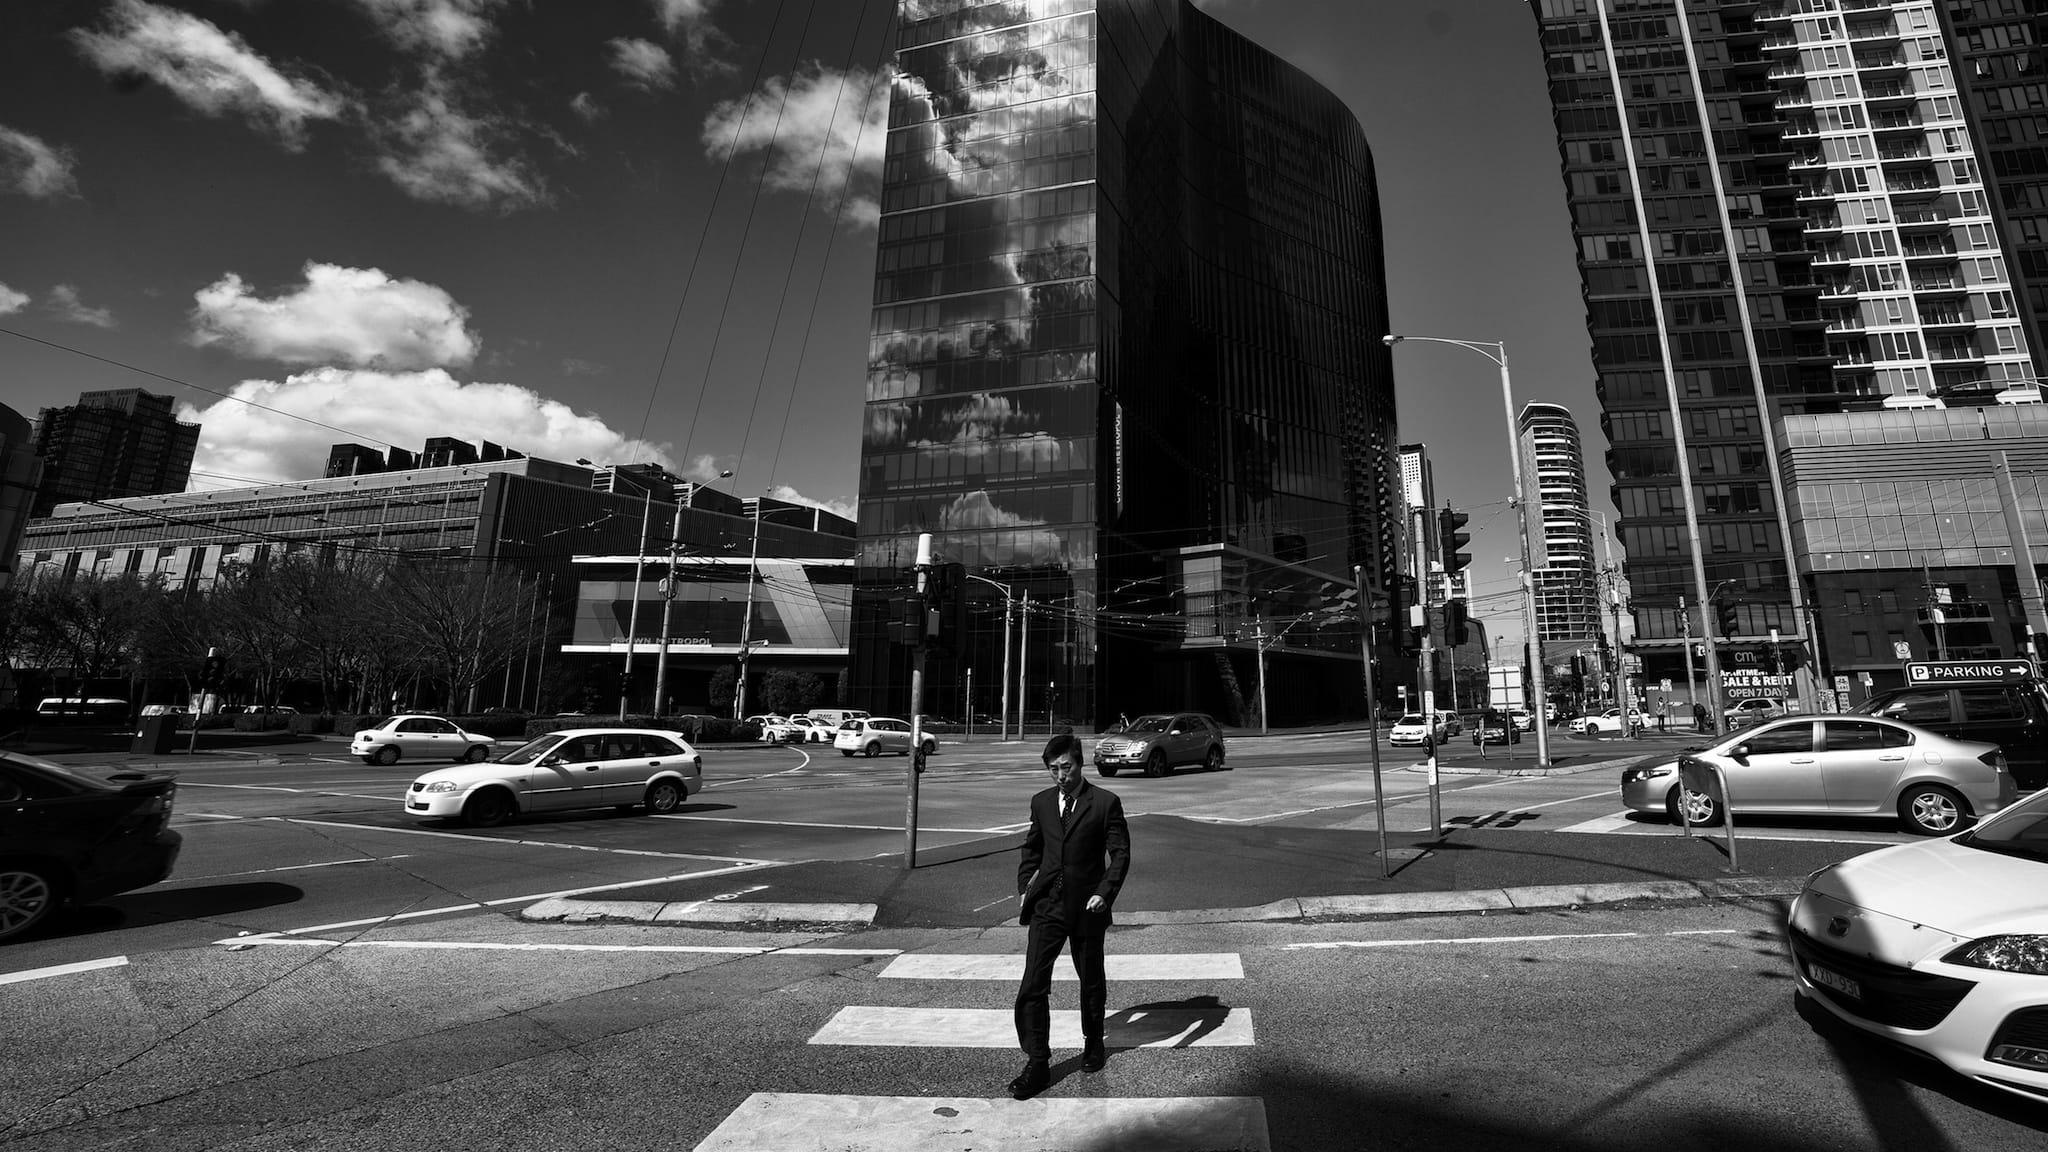 """Crosstown traffic"" by Yiannis Yiasaris"